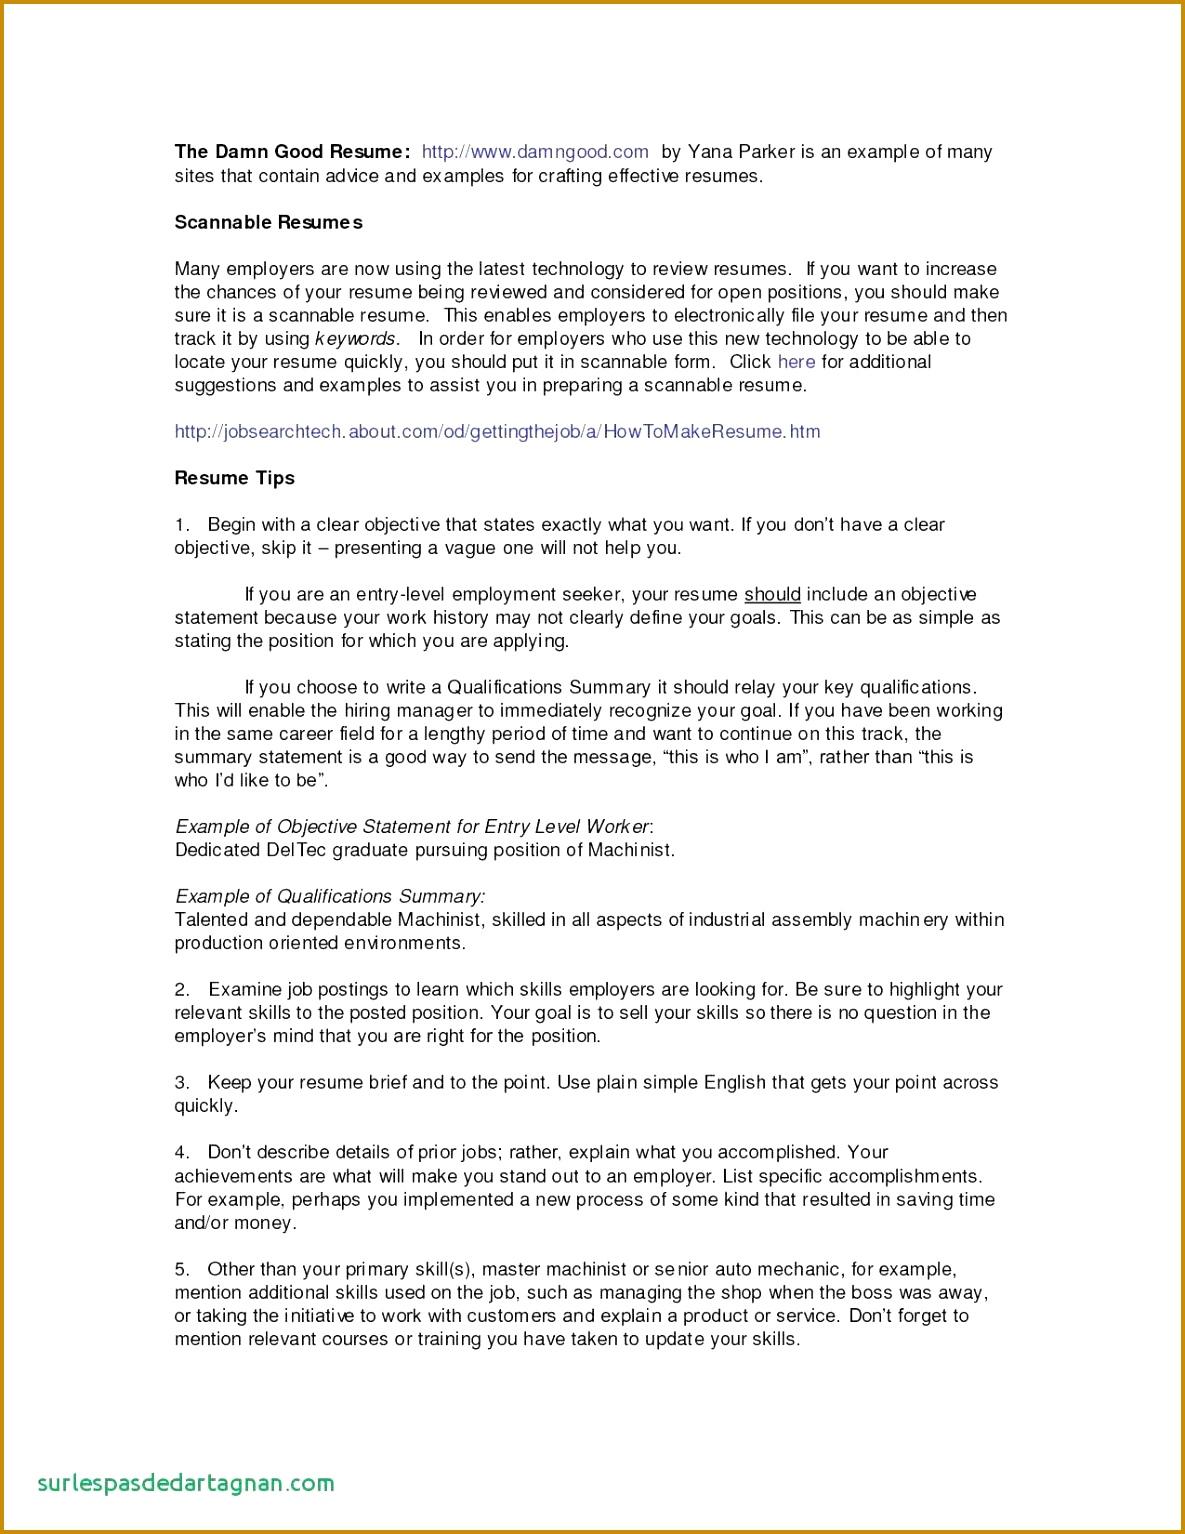 Lovely Resume Tutor Luxury Writing Your Resume Luxury Dishwasher Resume 0d What is A Resume Title 15341185